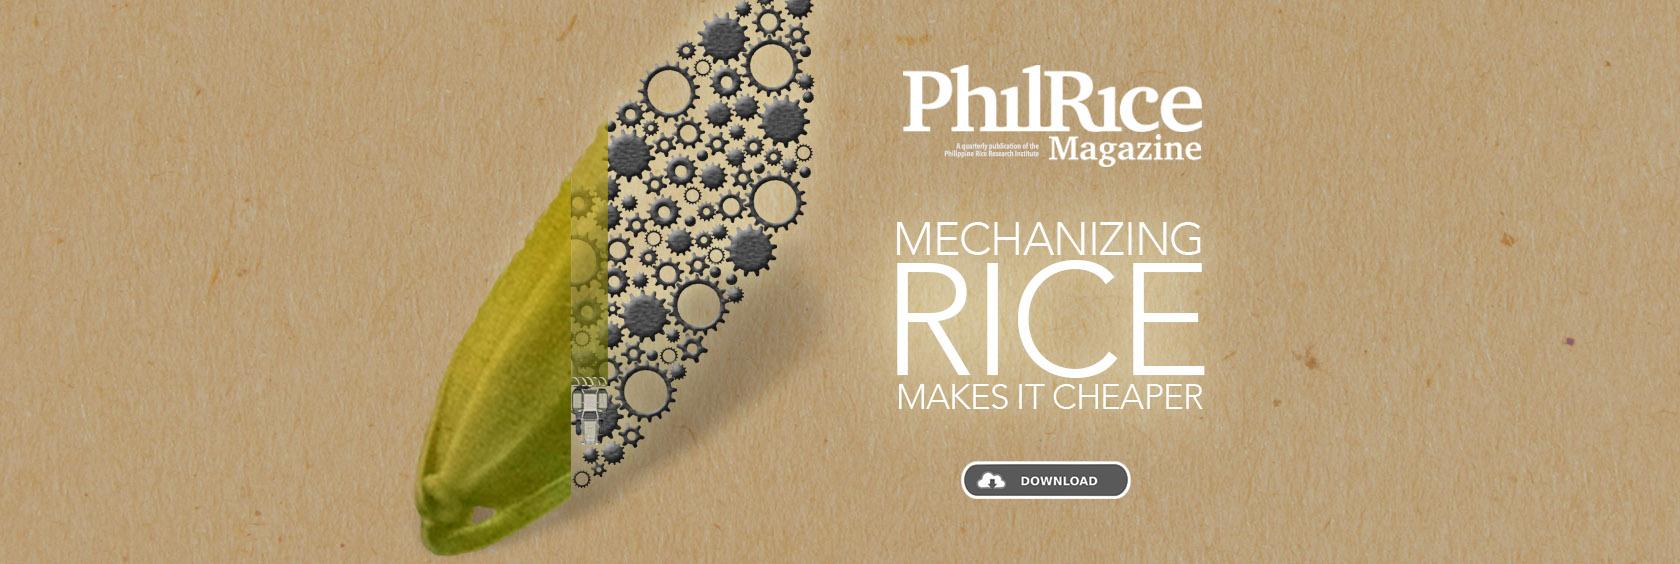 mechanical-rice-banner